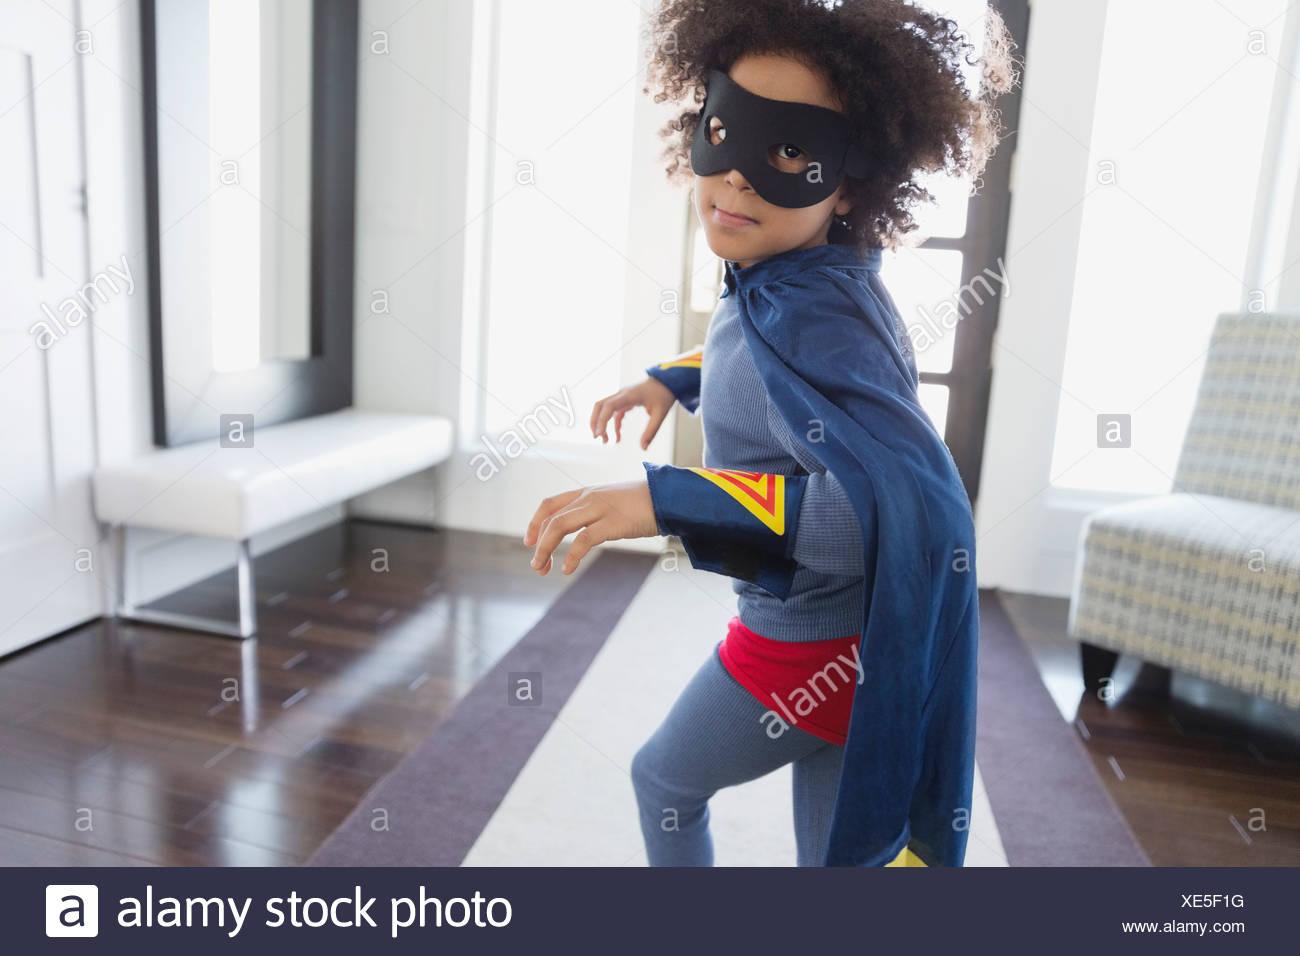 Boy pretending to be superhero at home - Stock Image